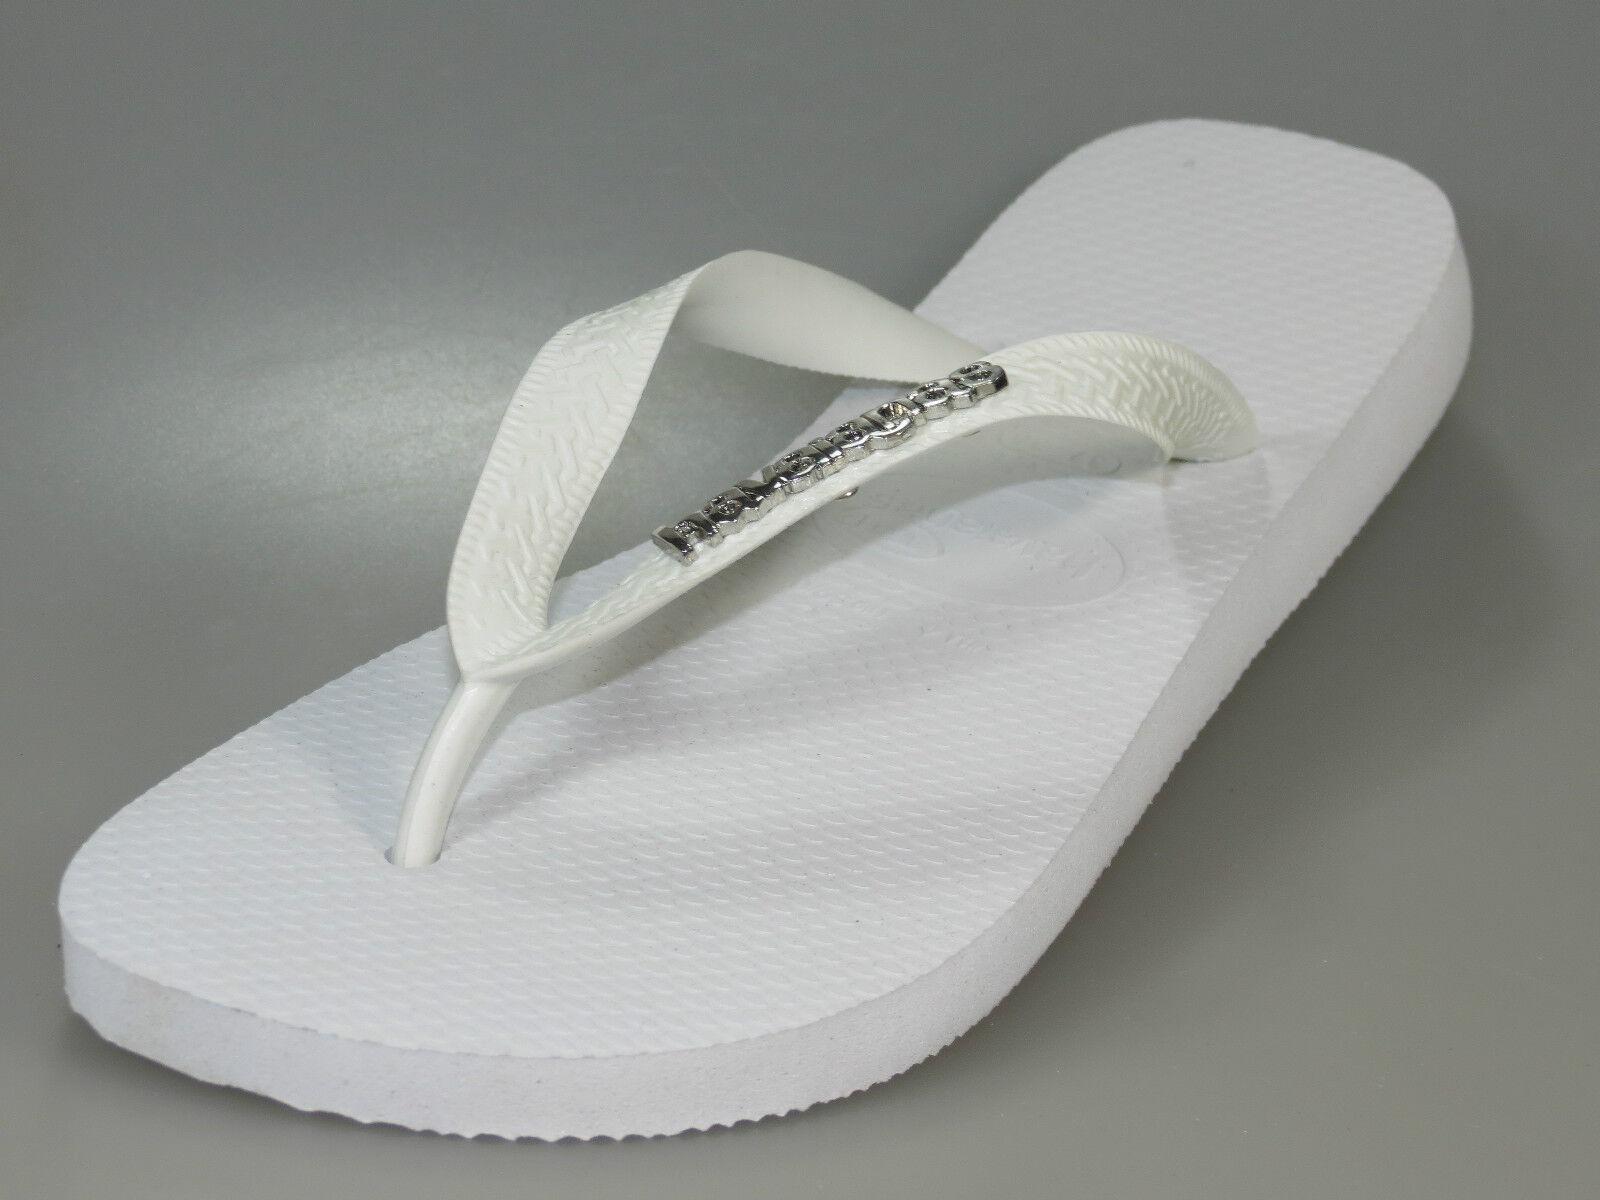 Havaianas top logotipo metálico sandalia blancoo 4.001.108 001 tira dedo + nuevo +